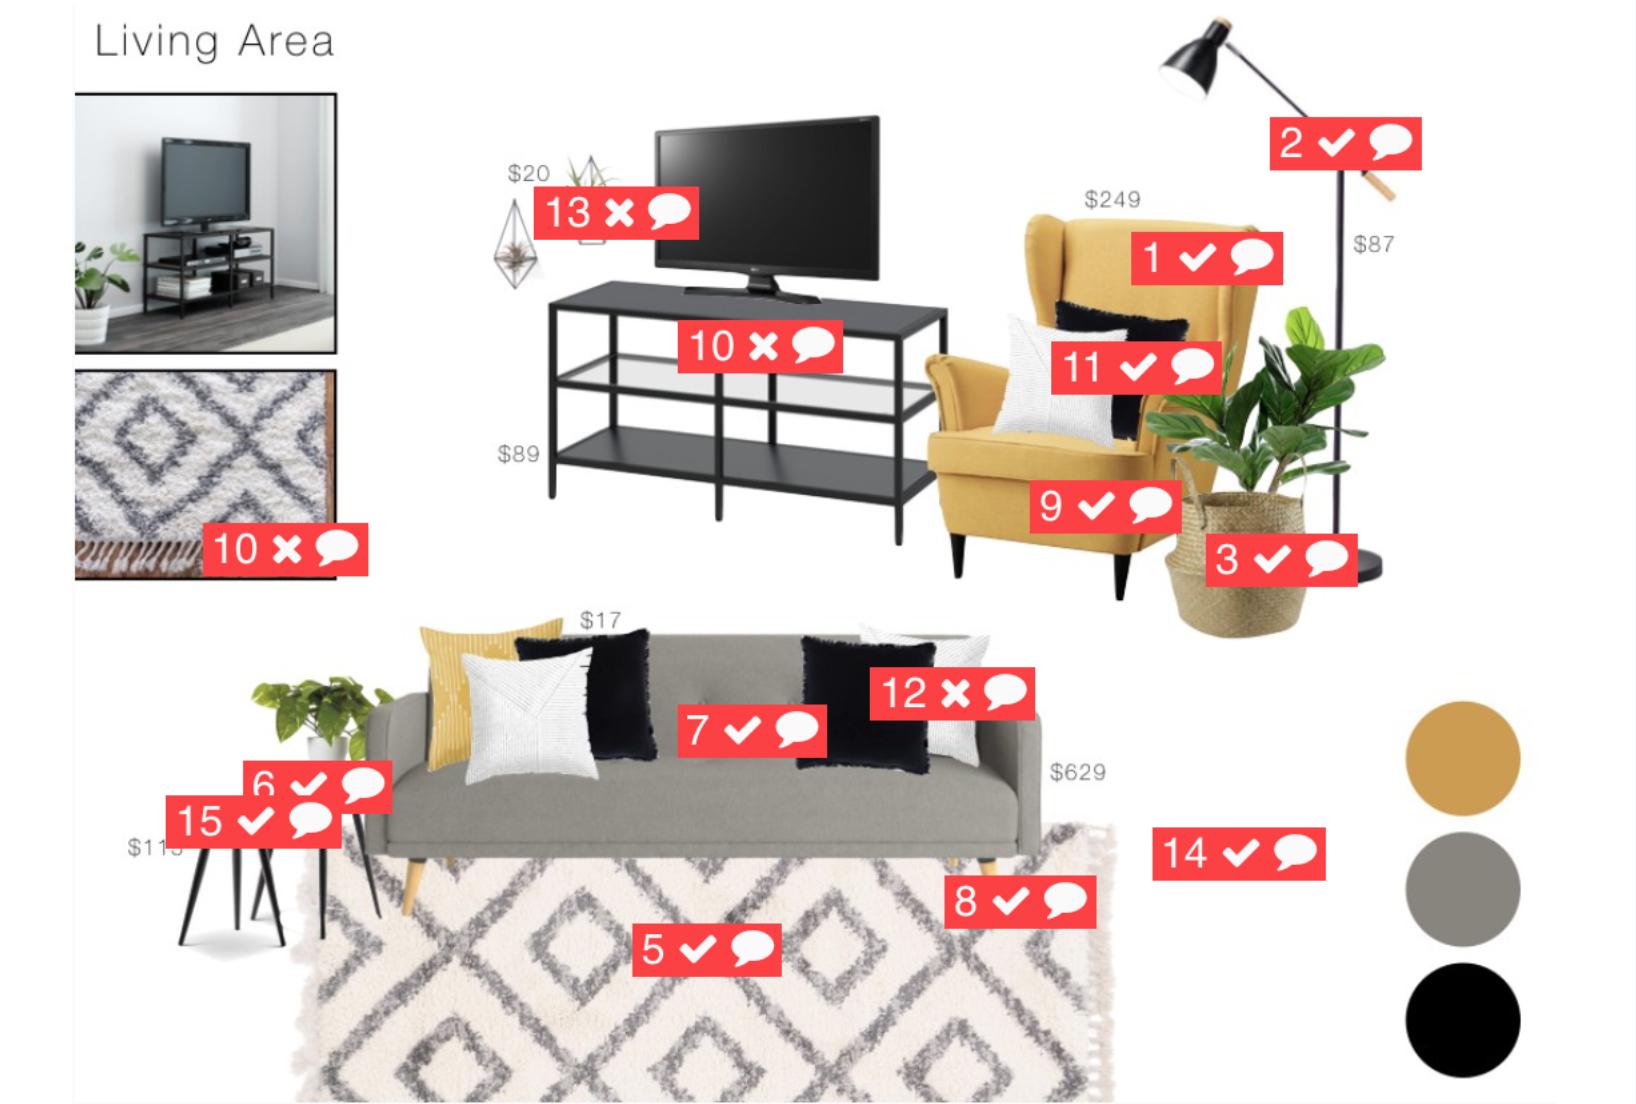 Online-Interior-Design-Service-Feedback-1